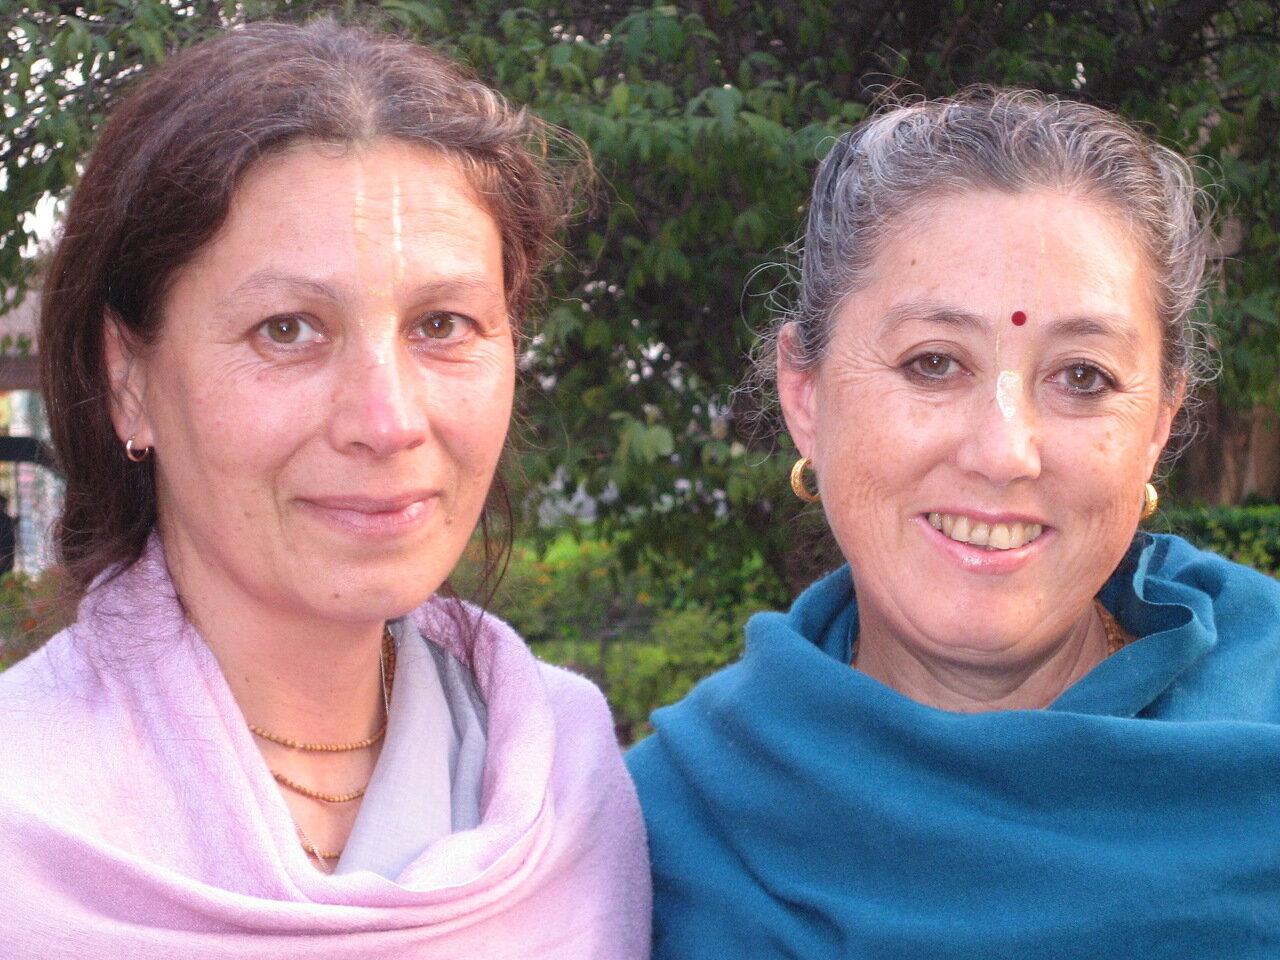 Вриндаван,  парк БиБиТи, матаджи - Тушти деви даси и ученица Шрилы Прабхупады